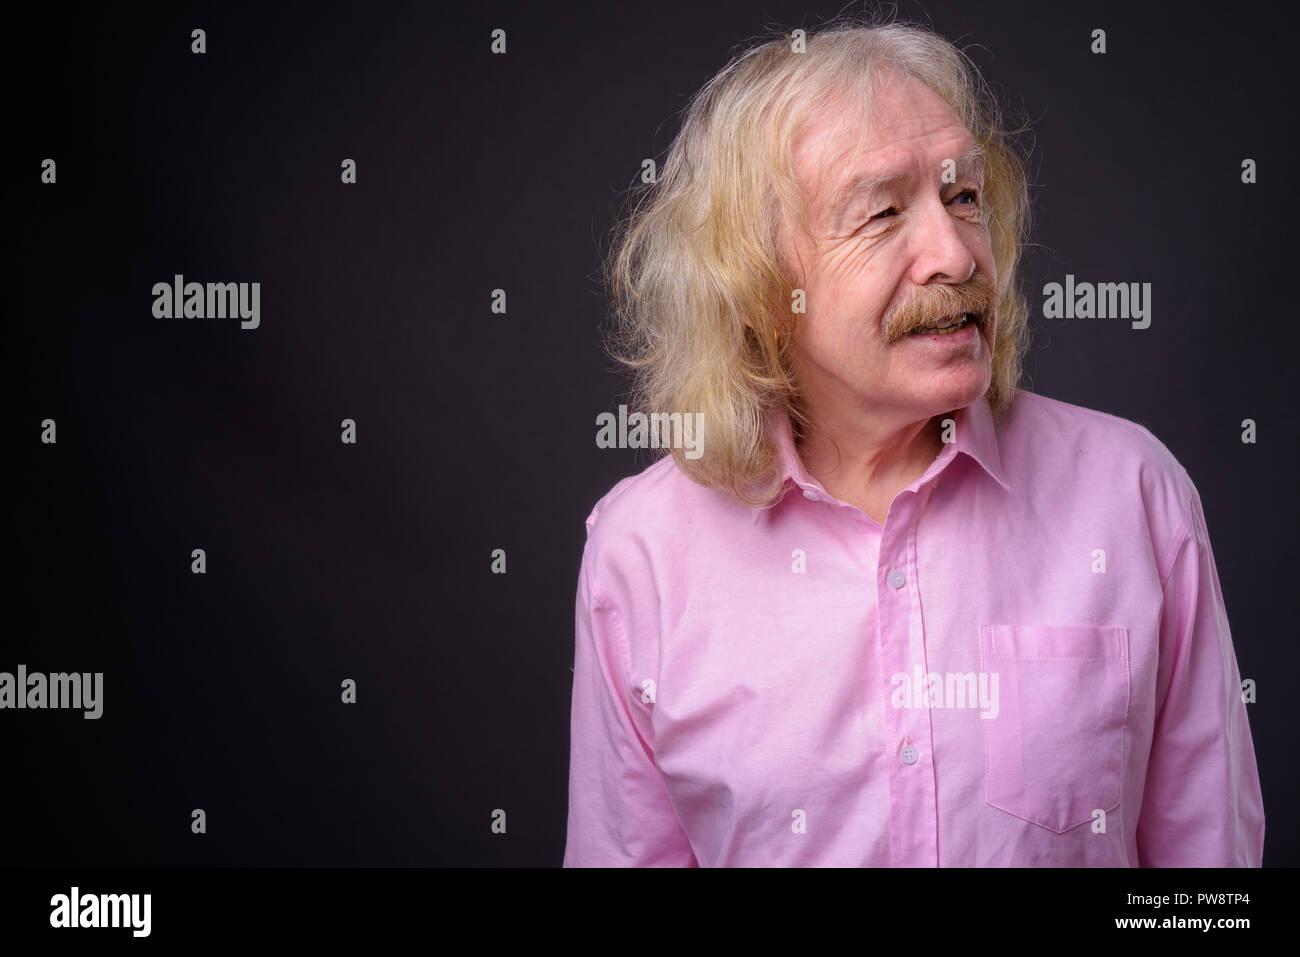 Senior businessman wearing pink shirt against gray background - Stock Image